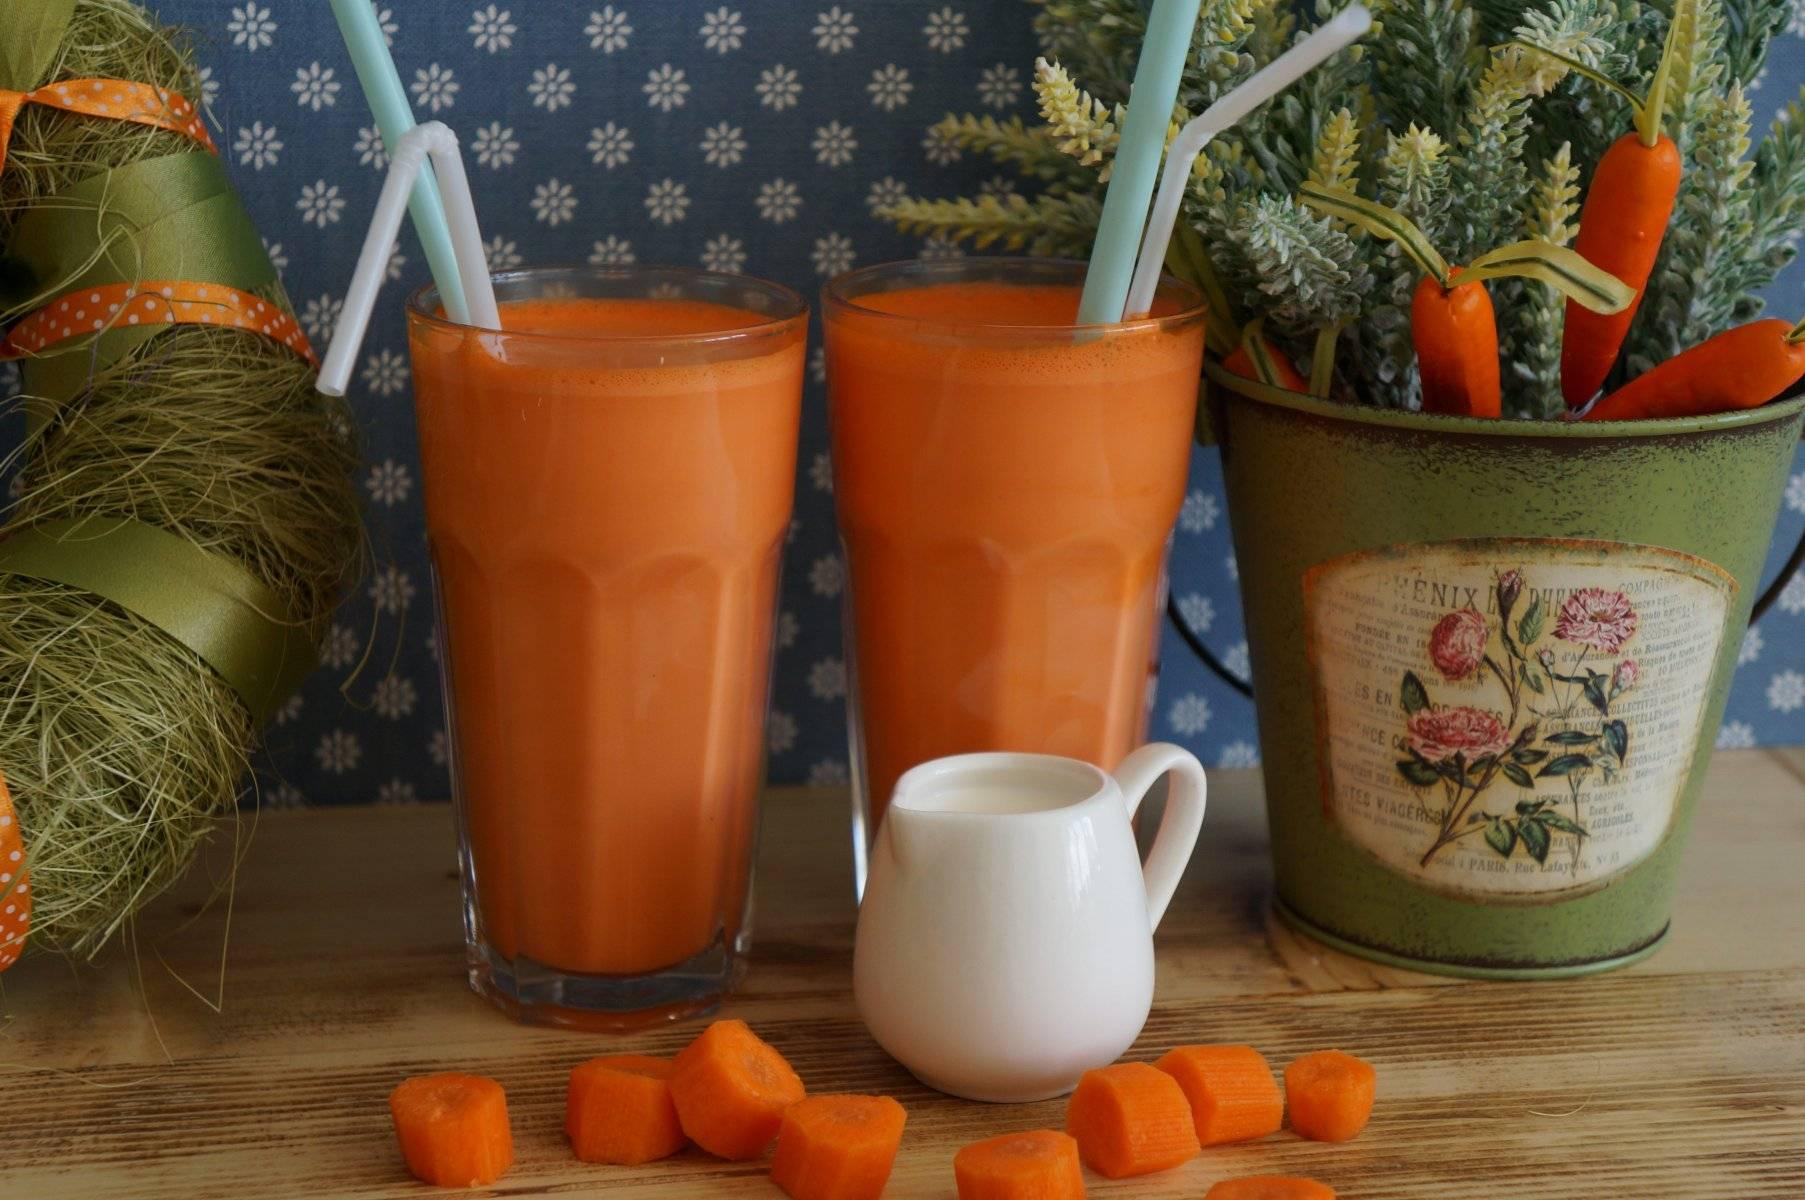 Вино из моркови в домашних условиях – 4 рецепта от профессионалов